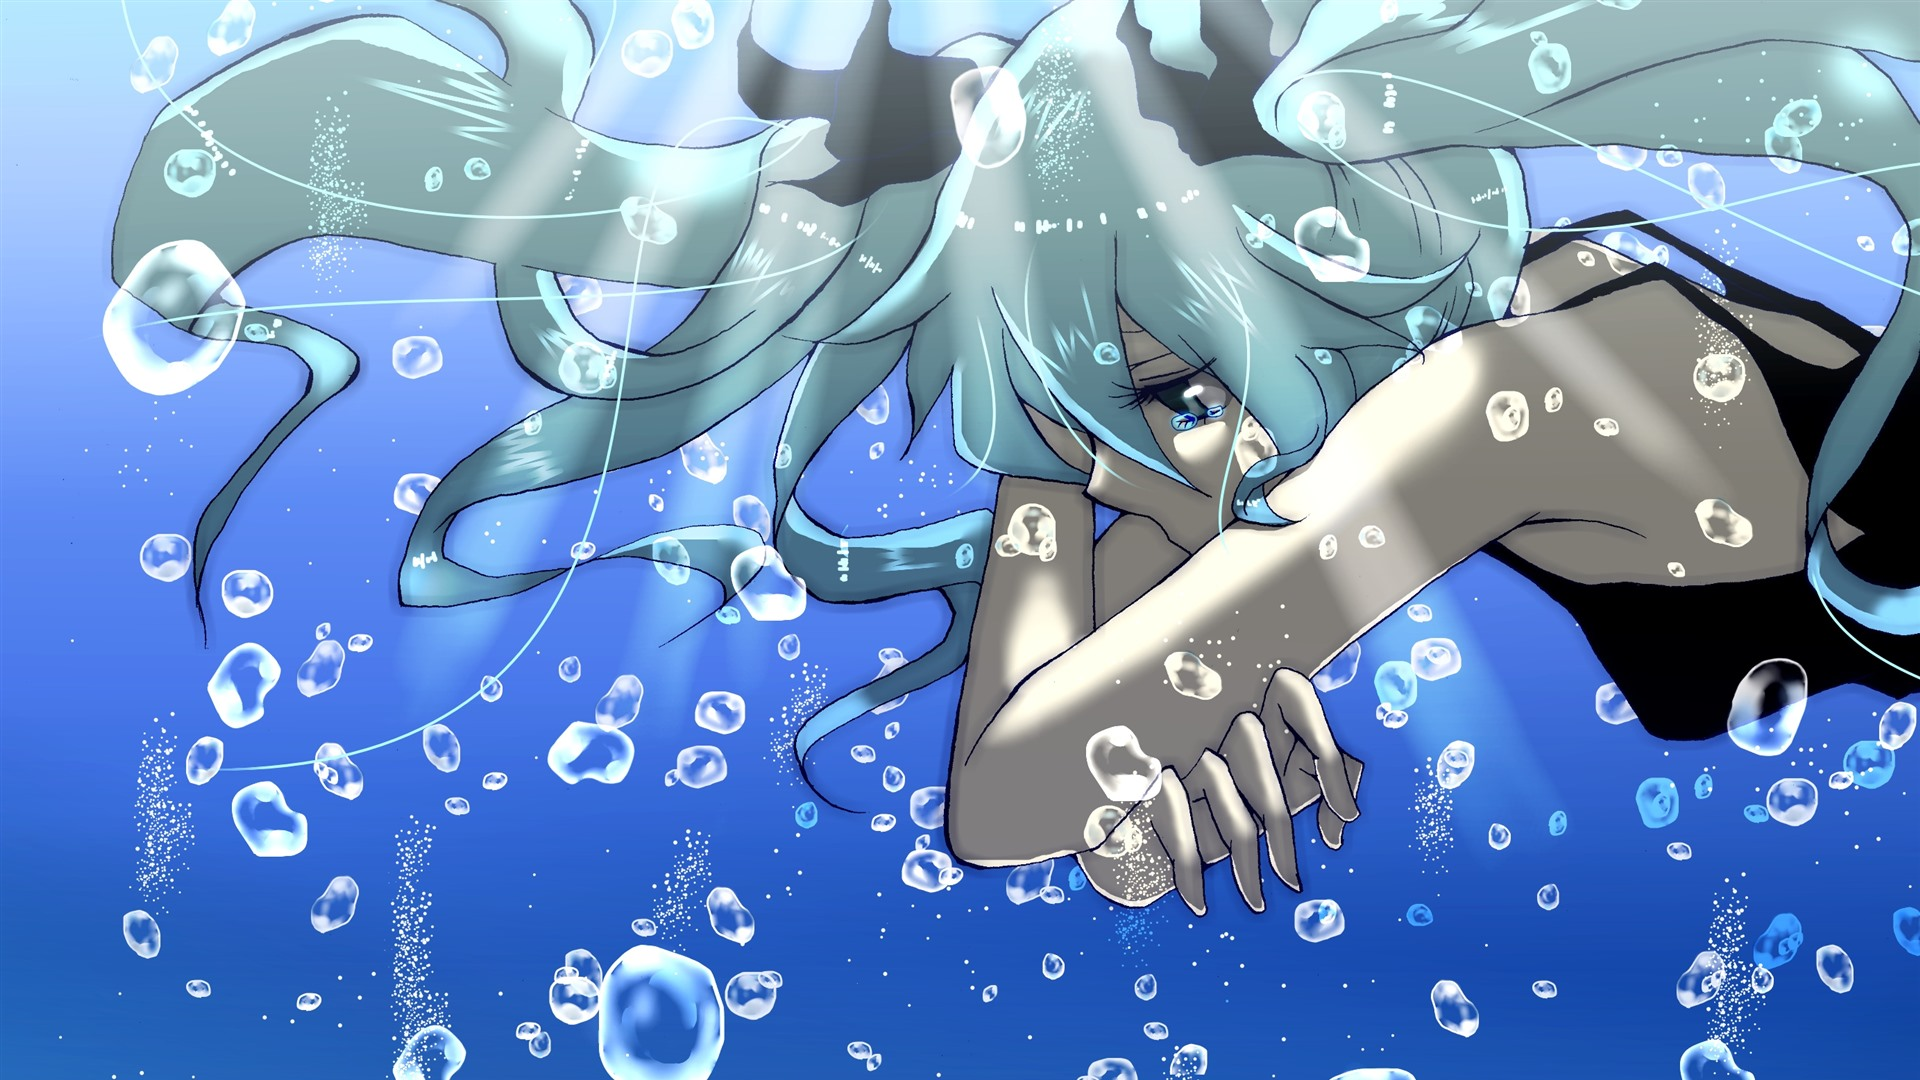 Wallpaper Sadness Anime Girl Blue Hair Tears Water Bubbles